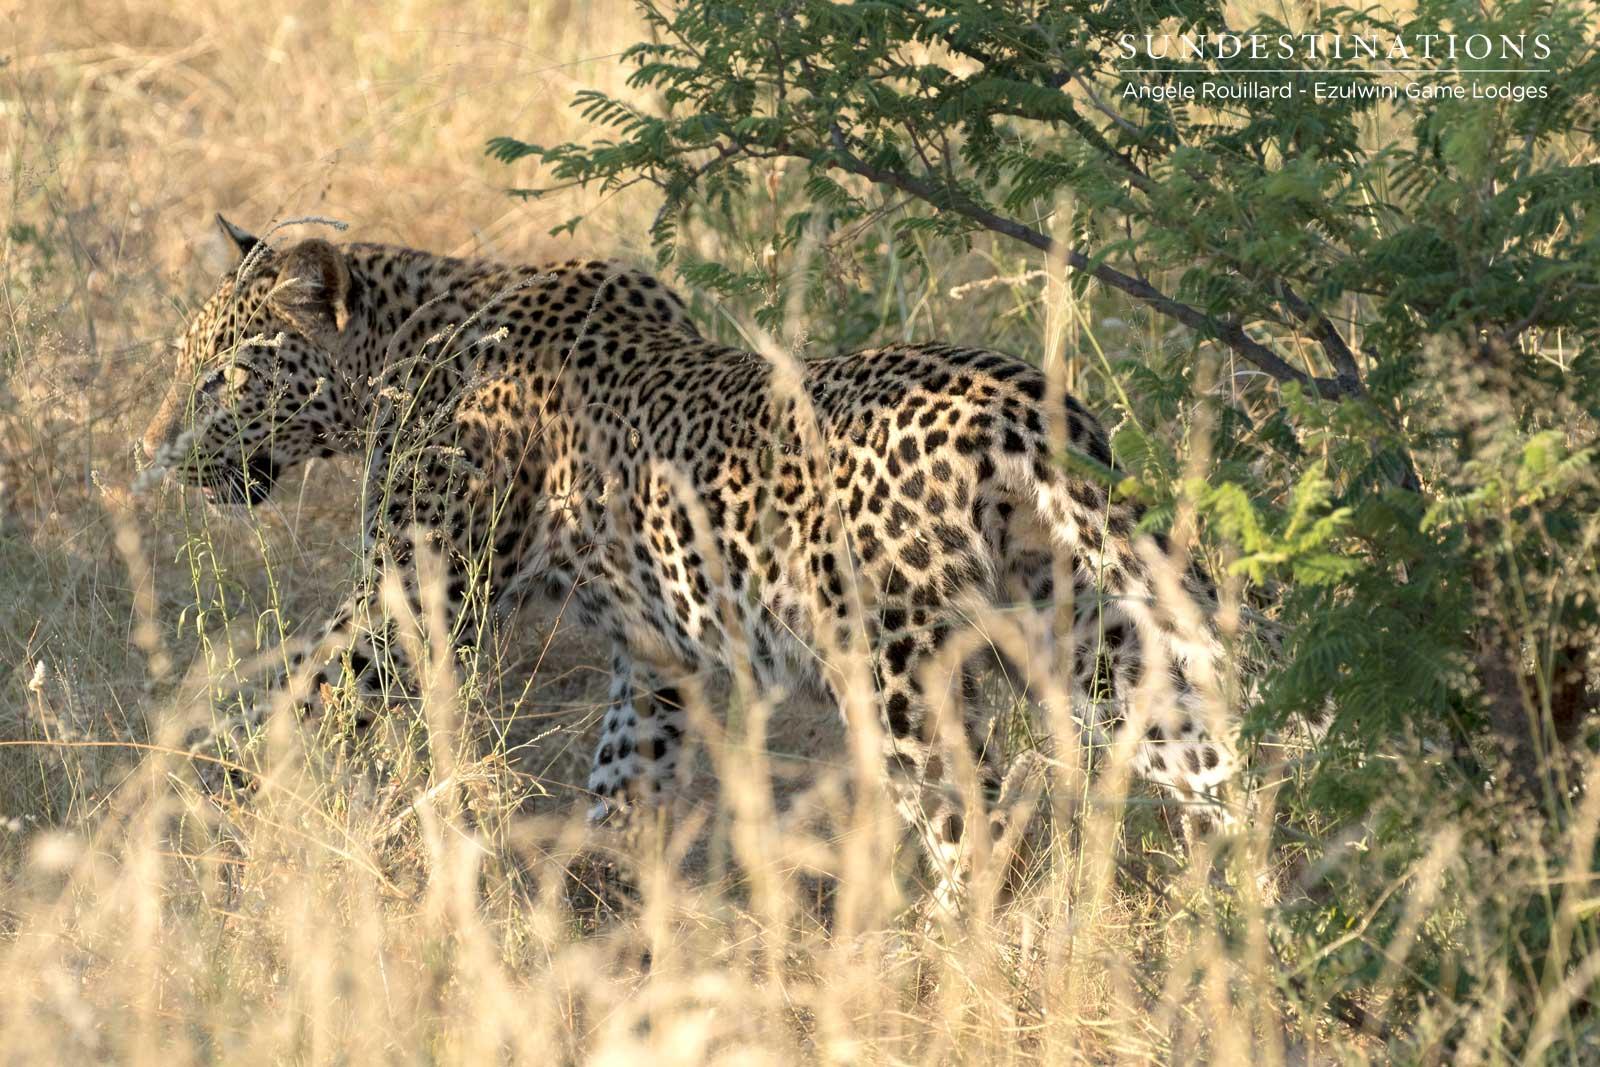 Leopard Cub at Ezulwini Game Lodges